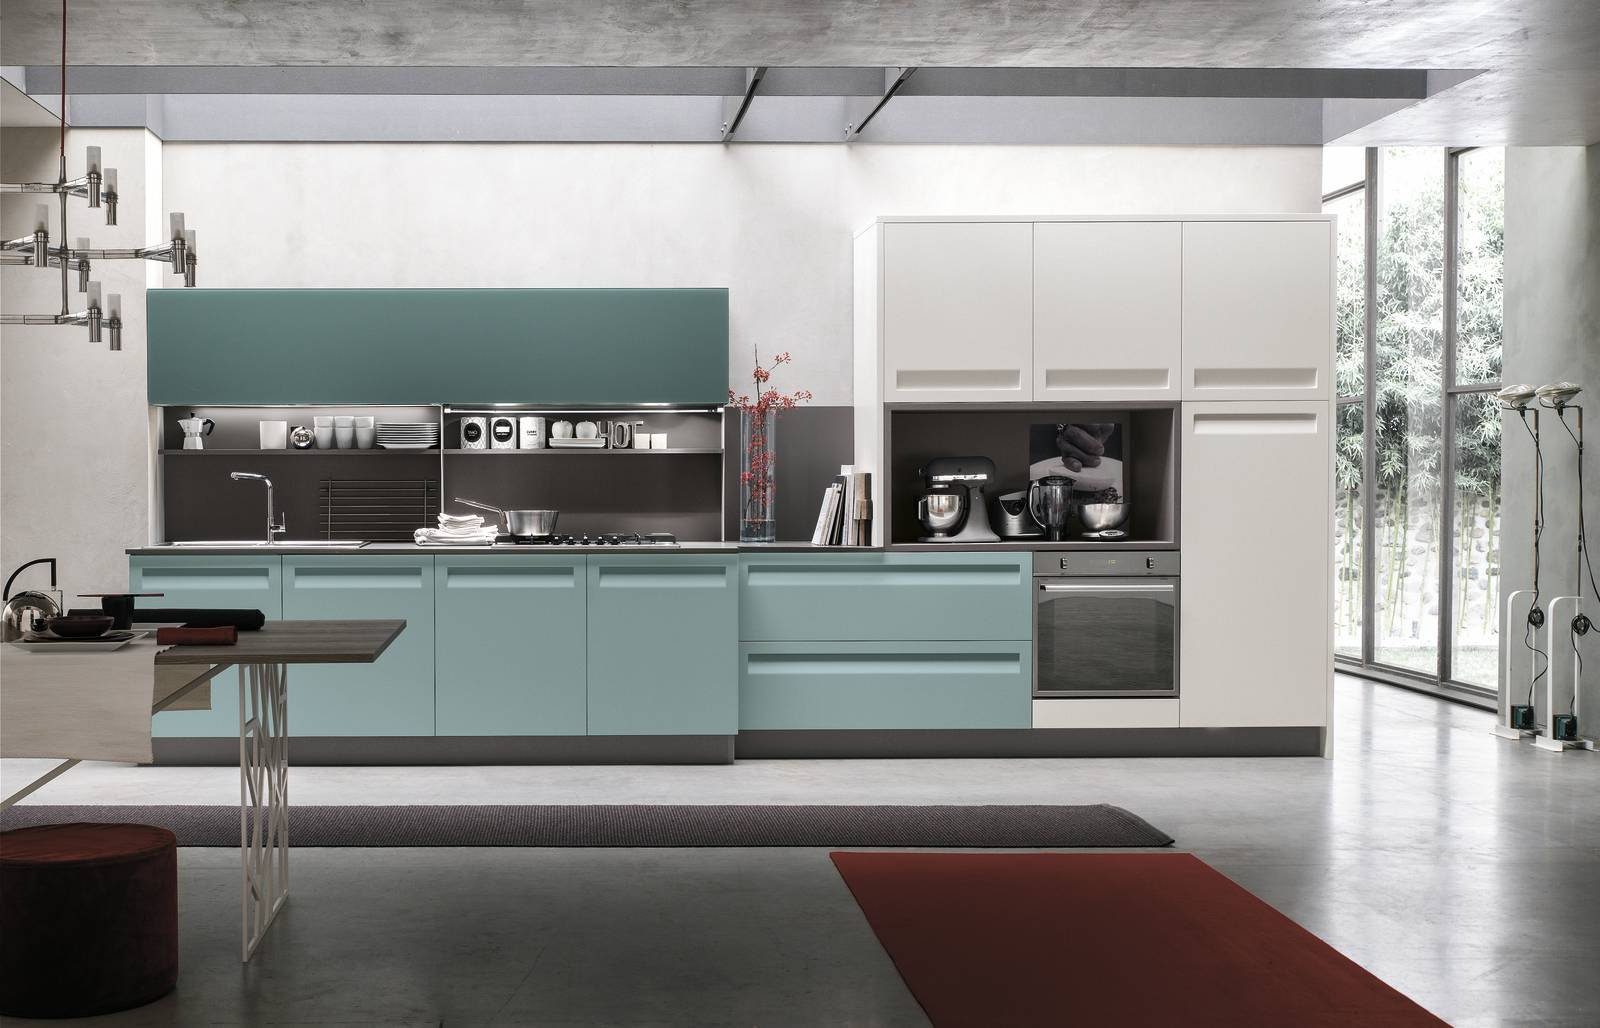 Cucina colorata 10 modelli supervivaci e moderni o sobri e tradizionali cose di casa - Cucine moderne colorate ...